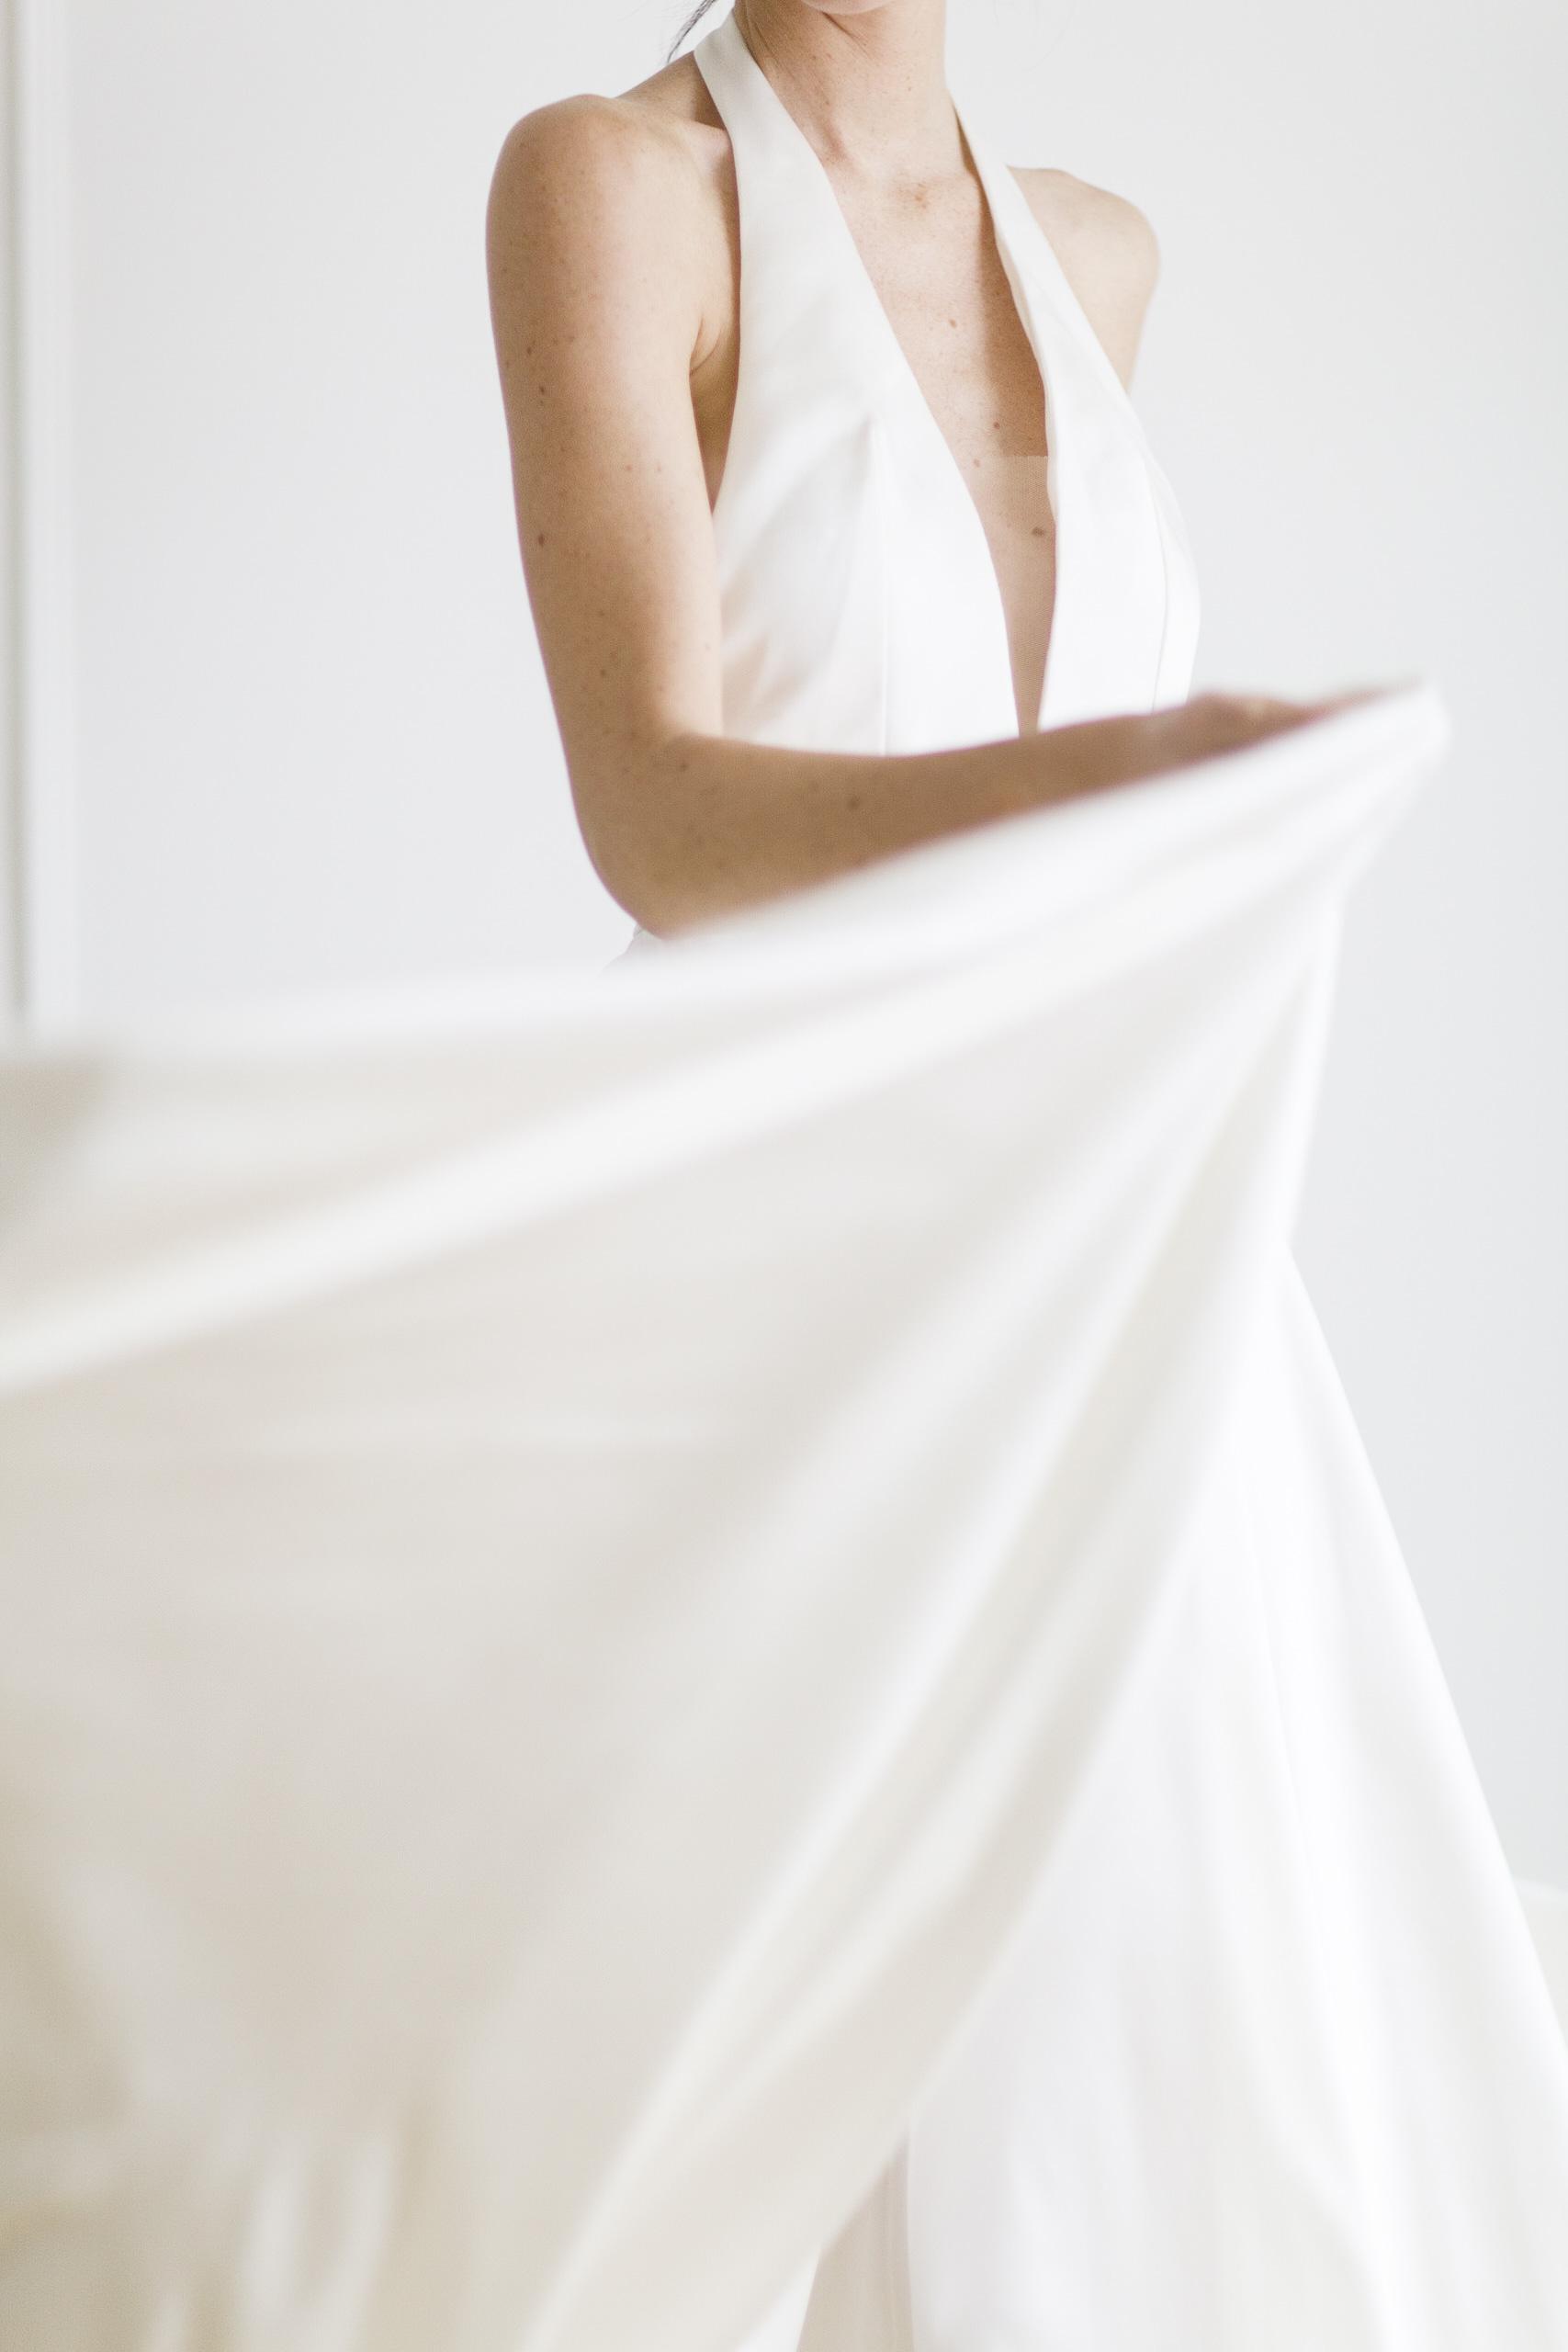 Ludovic Grau-Mingot - Film Photographer - Talitha - Wedding dresses - Collection 2019-25 (2).jpg